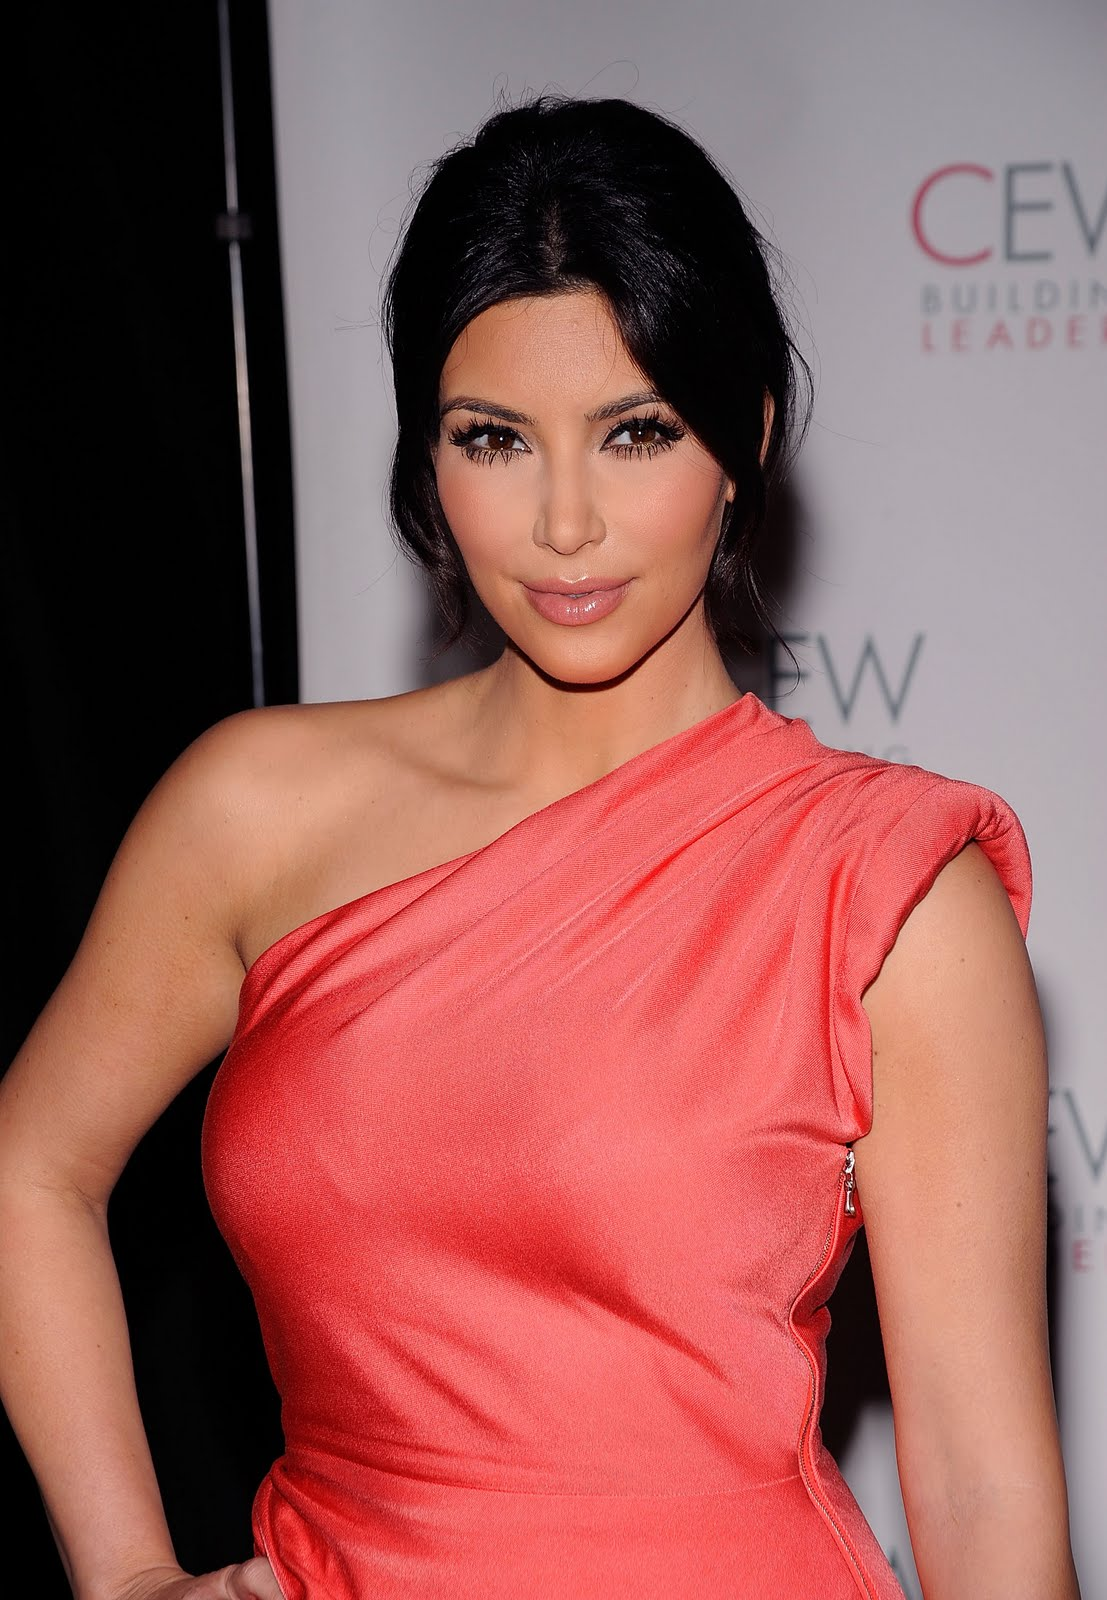 http://1.bp.blogspot.com/_H_IEA-URpJw/S_dG1EXT9oI/AAAAAAAAPo0/1RRvOR2Rikg/s1600/_KimKardashian_2010CosmeticExecutiveWomenBeautyAwards__Kim-Kardashian_2010-Cosmetic-Executive-Women-Beauty-Awards_3.jpg